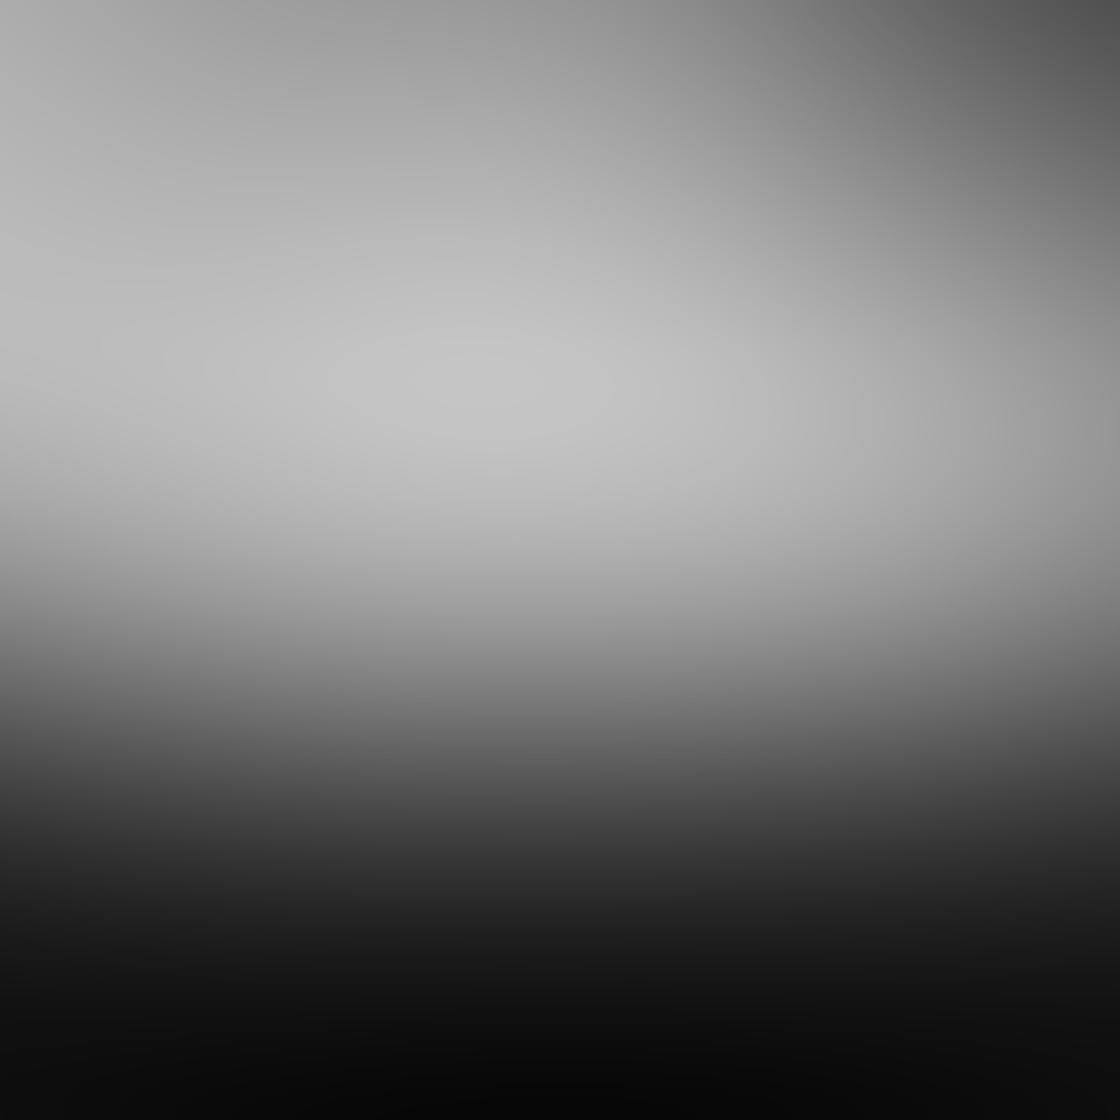 iPhone Photo Vignette 57